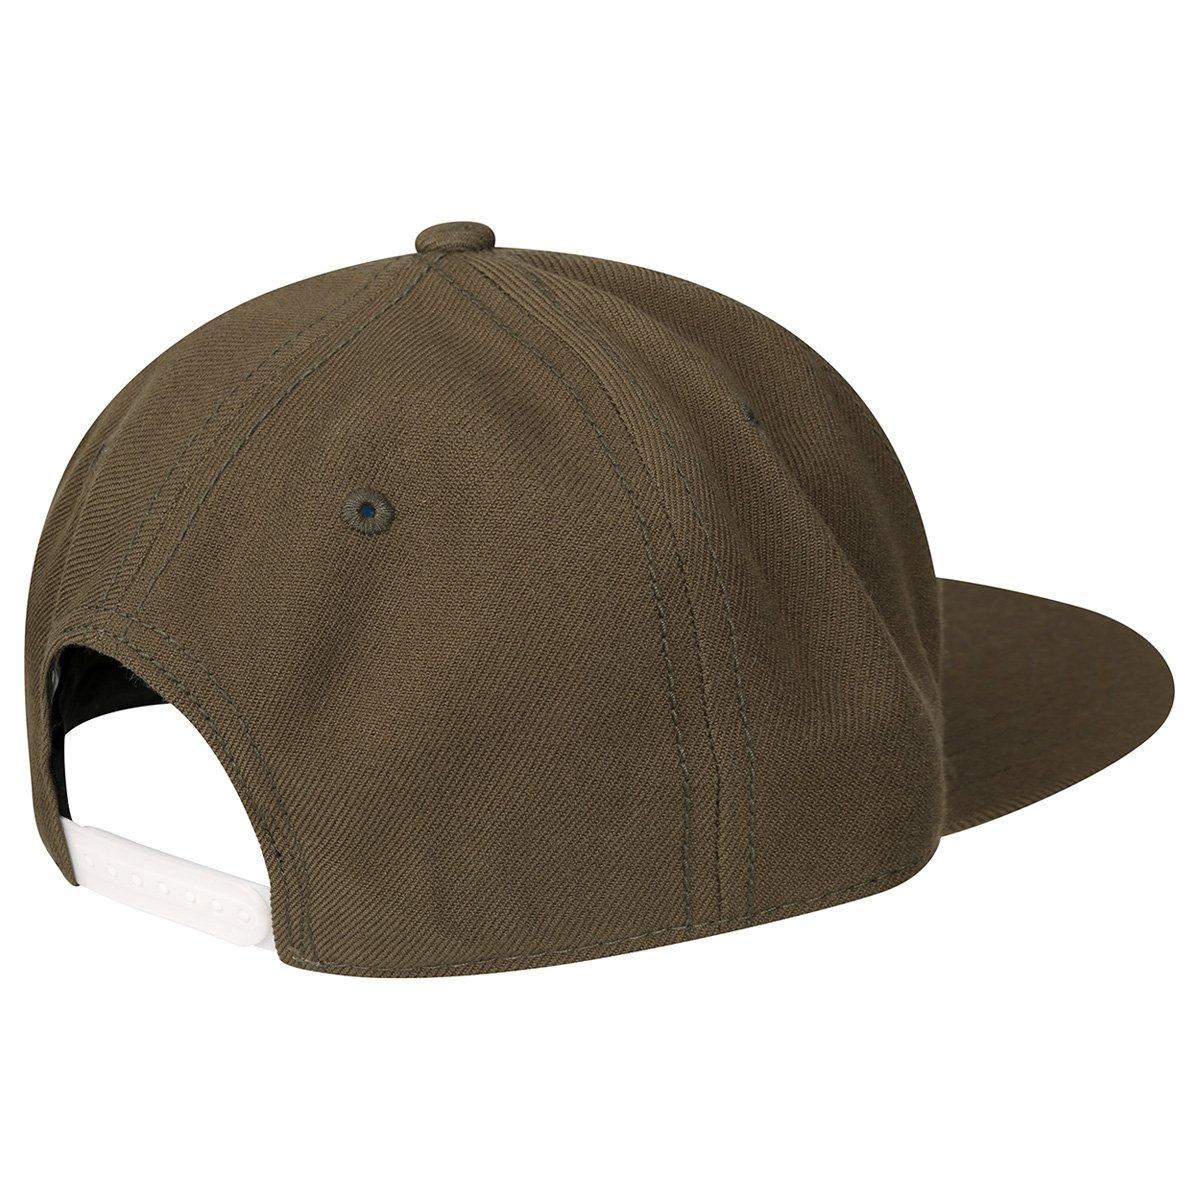 ... uk boné oakley aba reta mod octane hat masculino 632b1 e71e4 62a8f9d4671